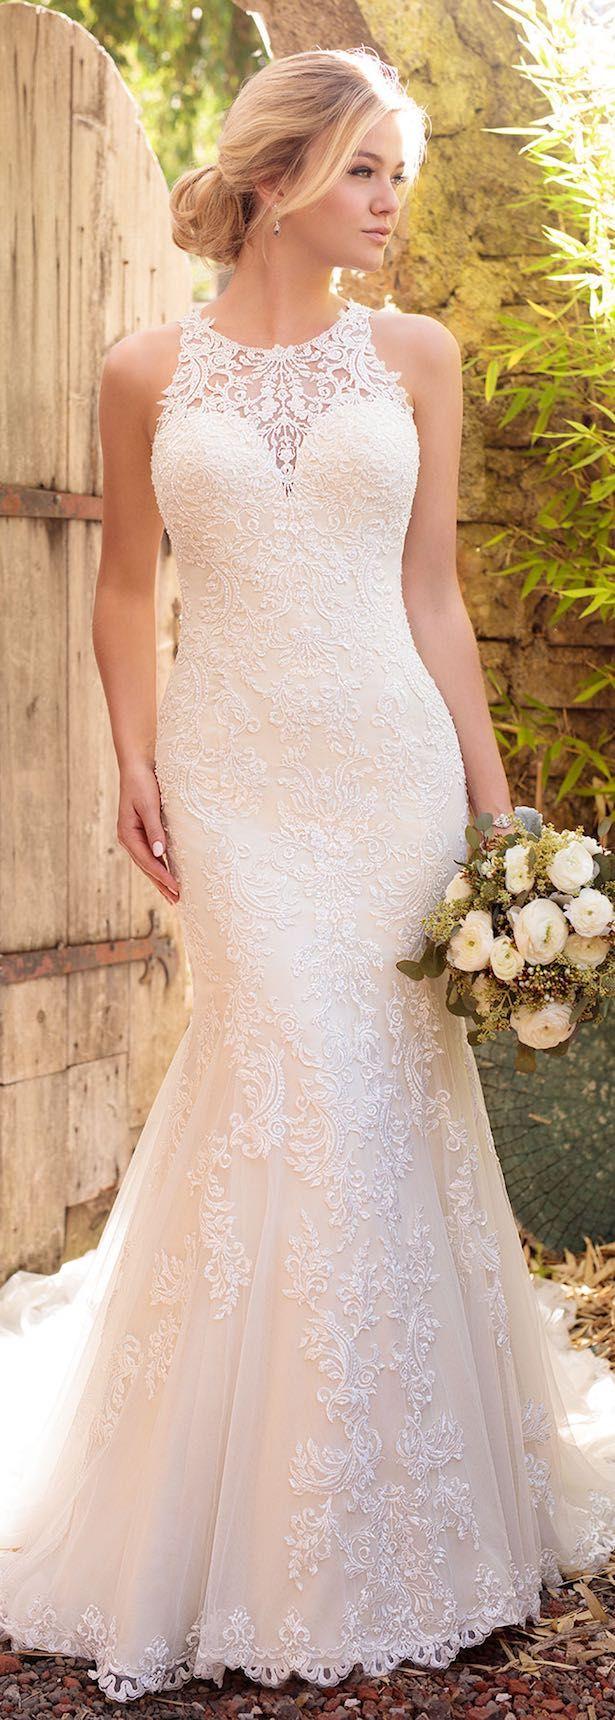 wedding dresses dress for a wedding Essense of Australia Fall Trumpet Wedding DressesWeeding